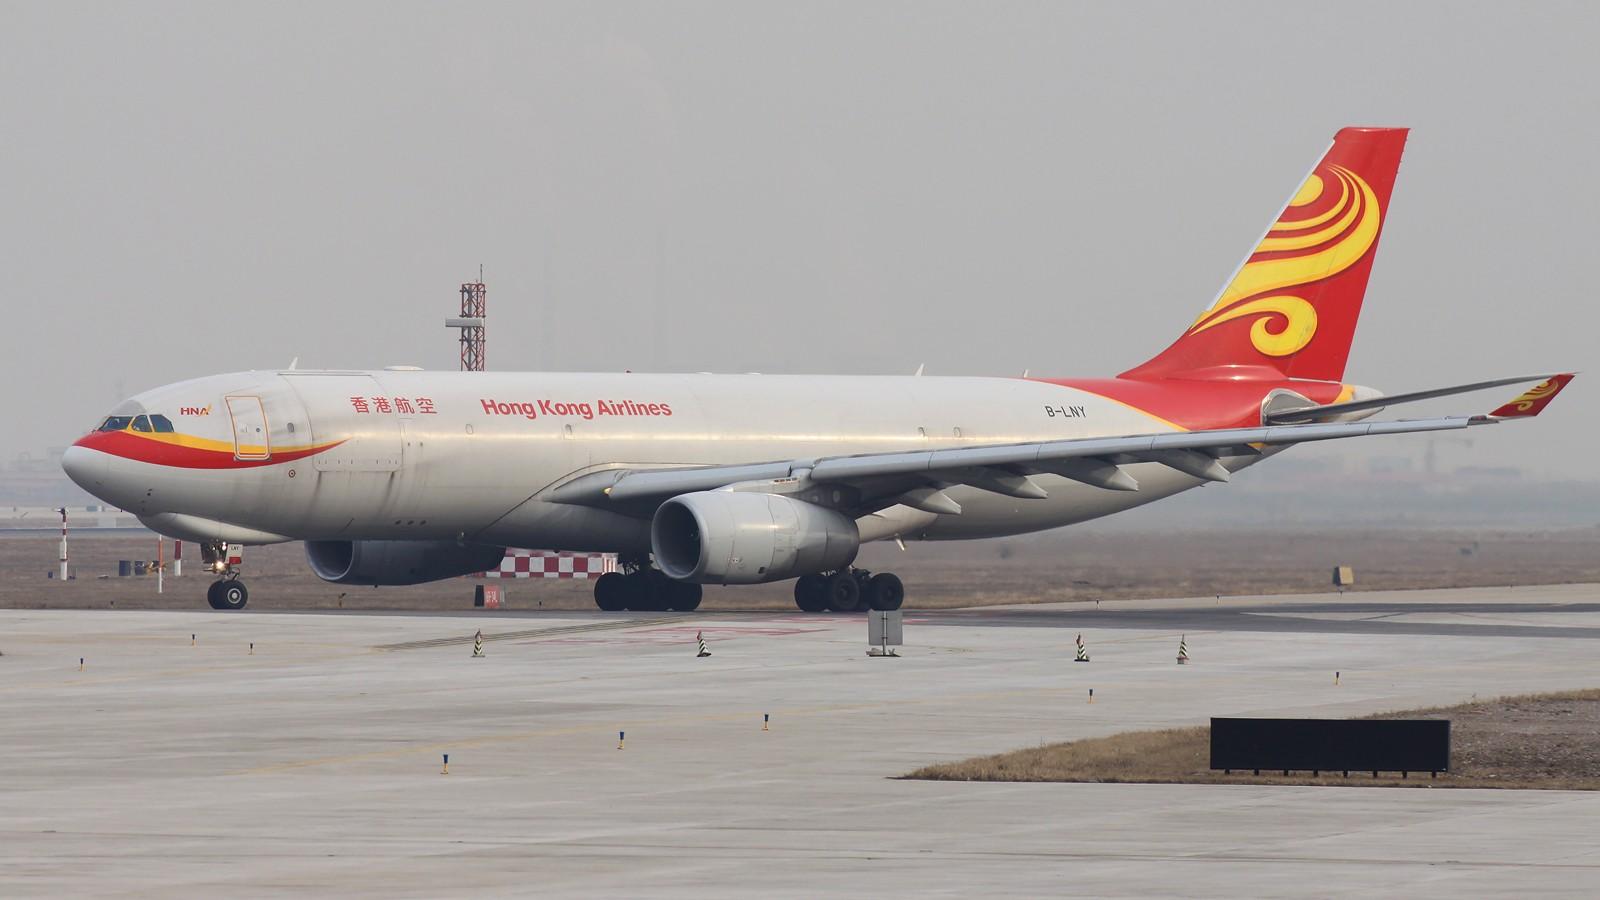 �:f&LNy�o_另杂图一组【20p】 airbus a330-243f b-lny 中国天津滨海机场